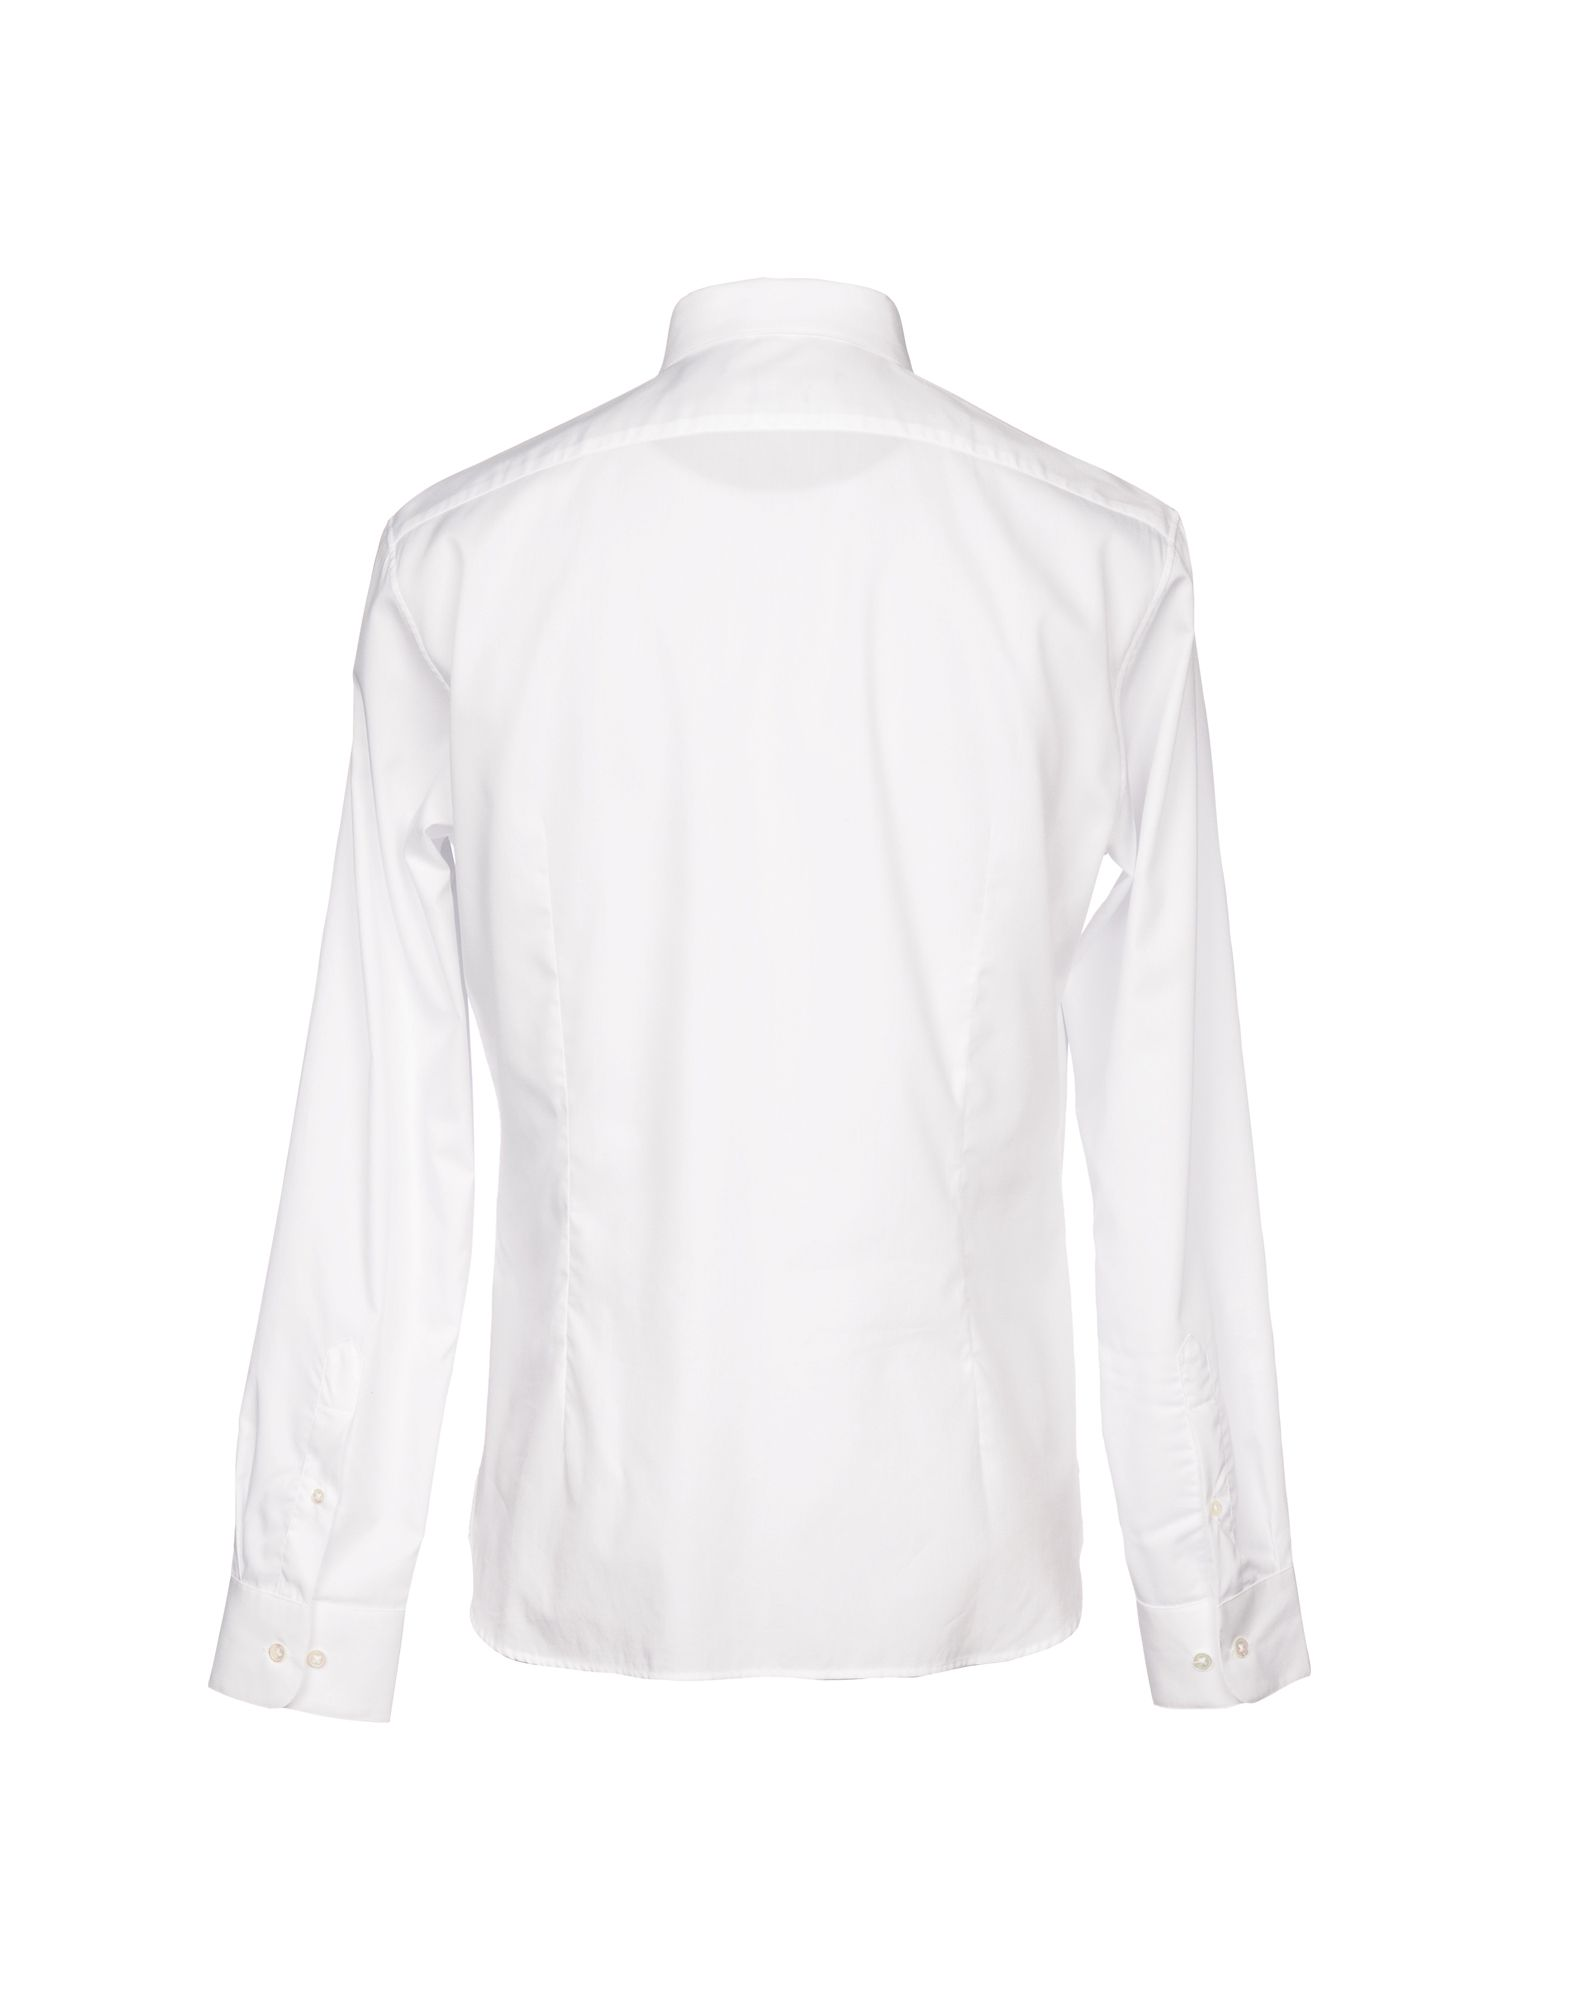 Camicia Tinta Unita Varvatos John Varvatos Unita Uomo - 38729516RW 4b7e92